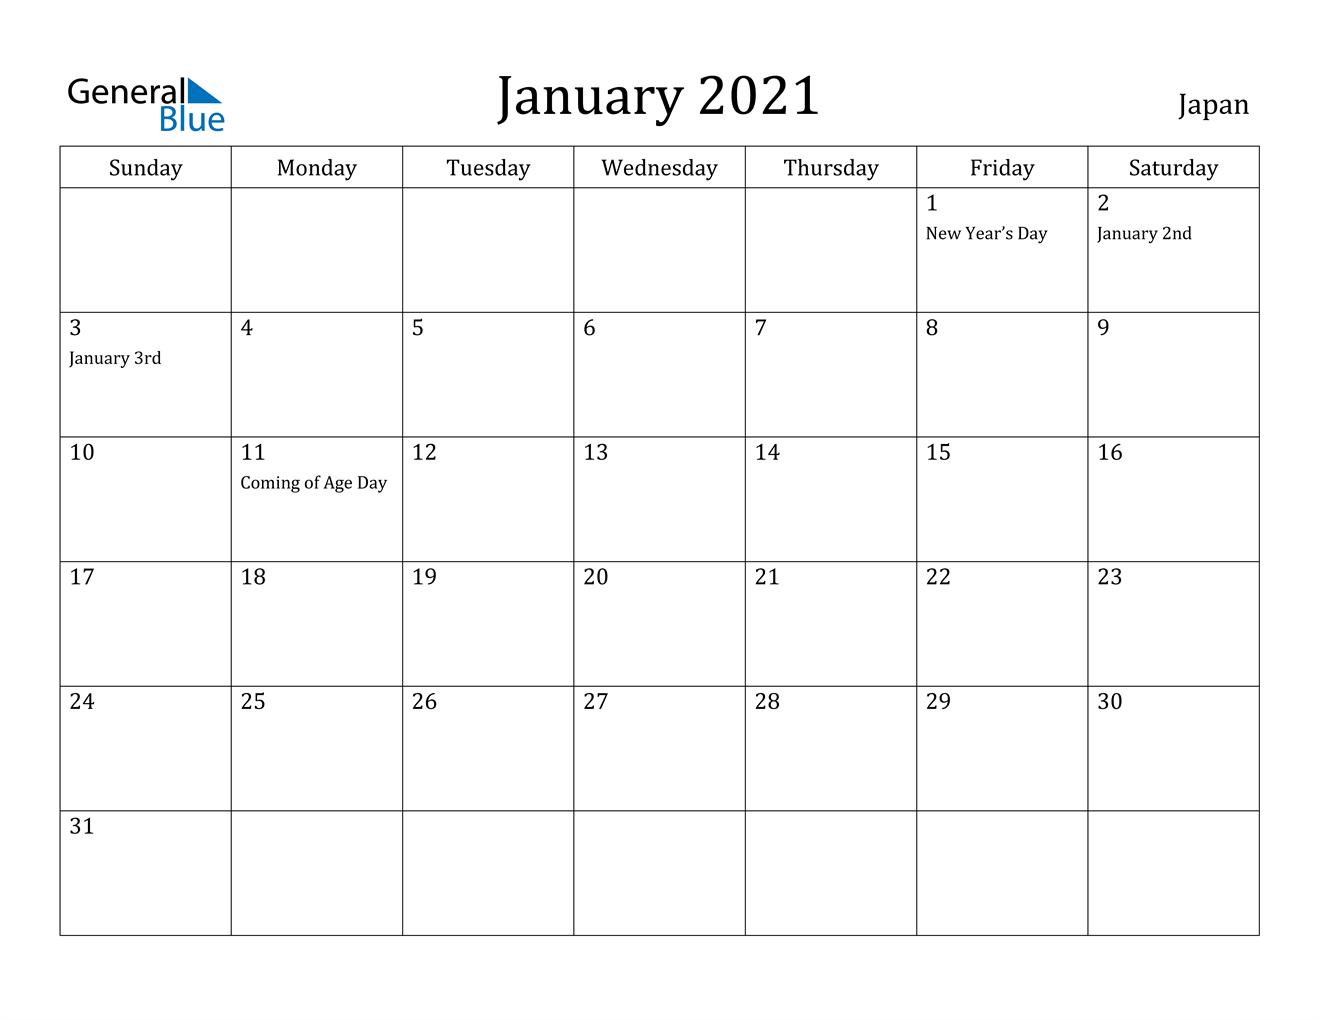 January 2021 Calendar - Japan